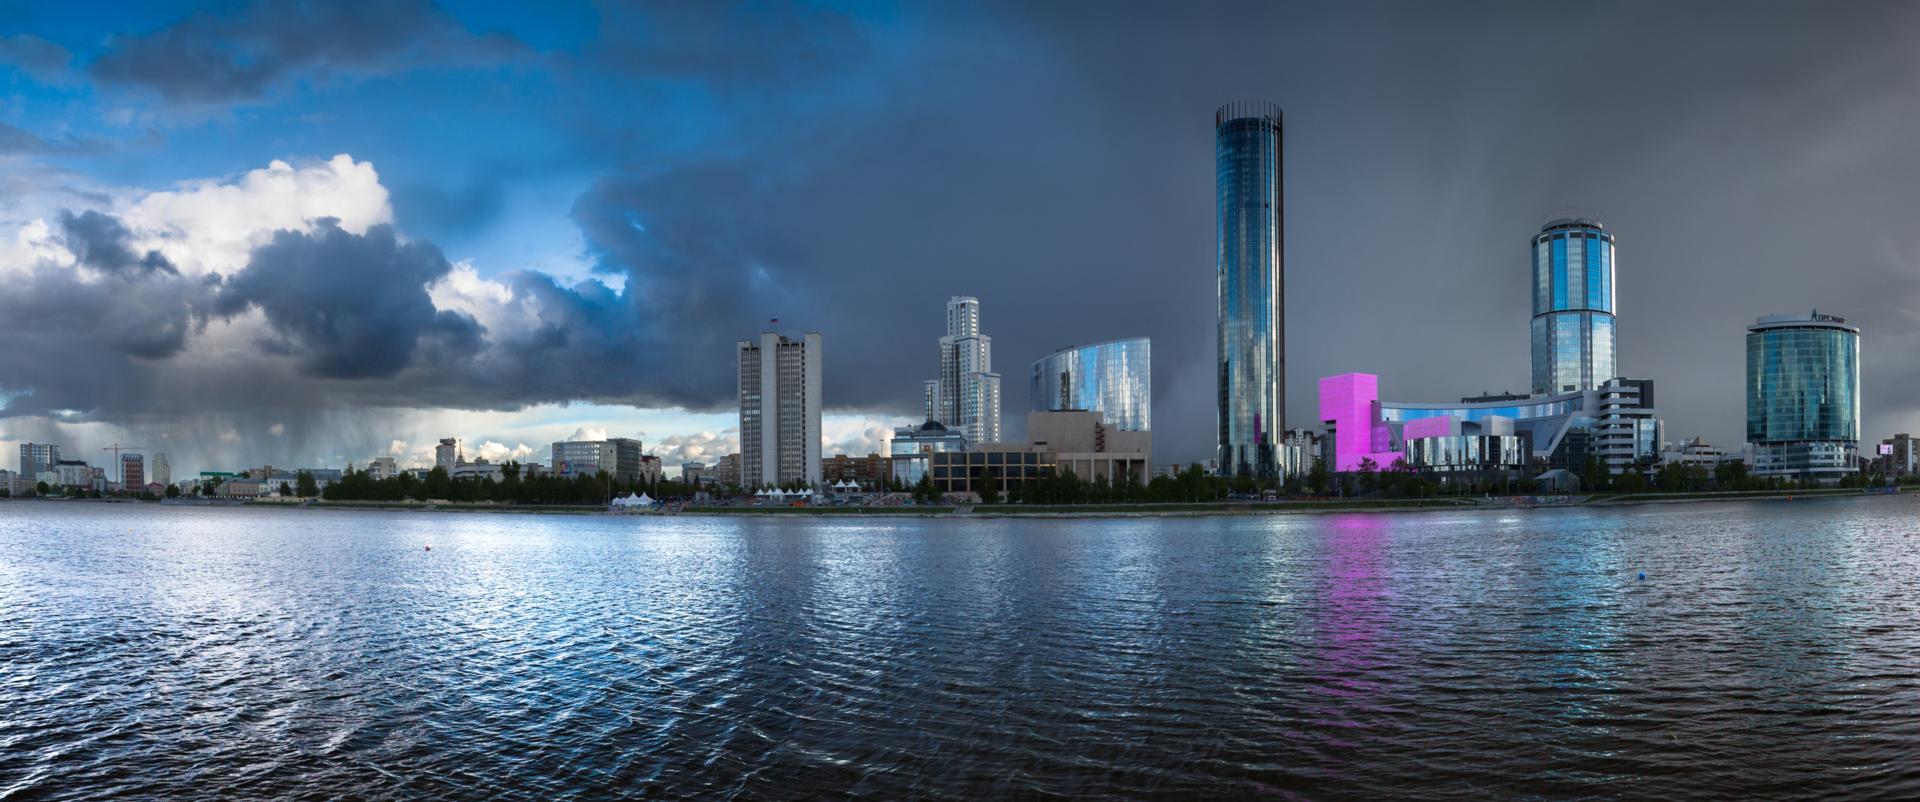 Sustainable Urbanization: Is Asia Prepared?